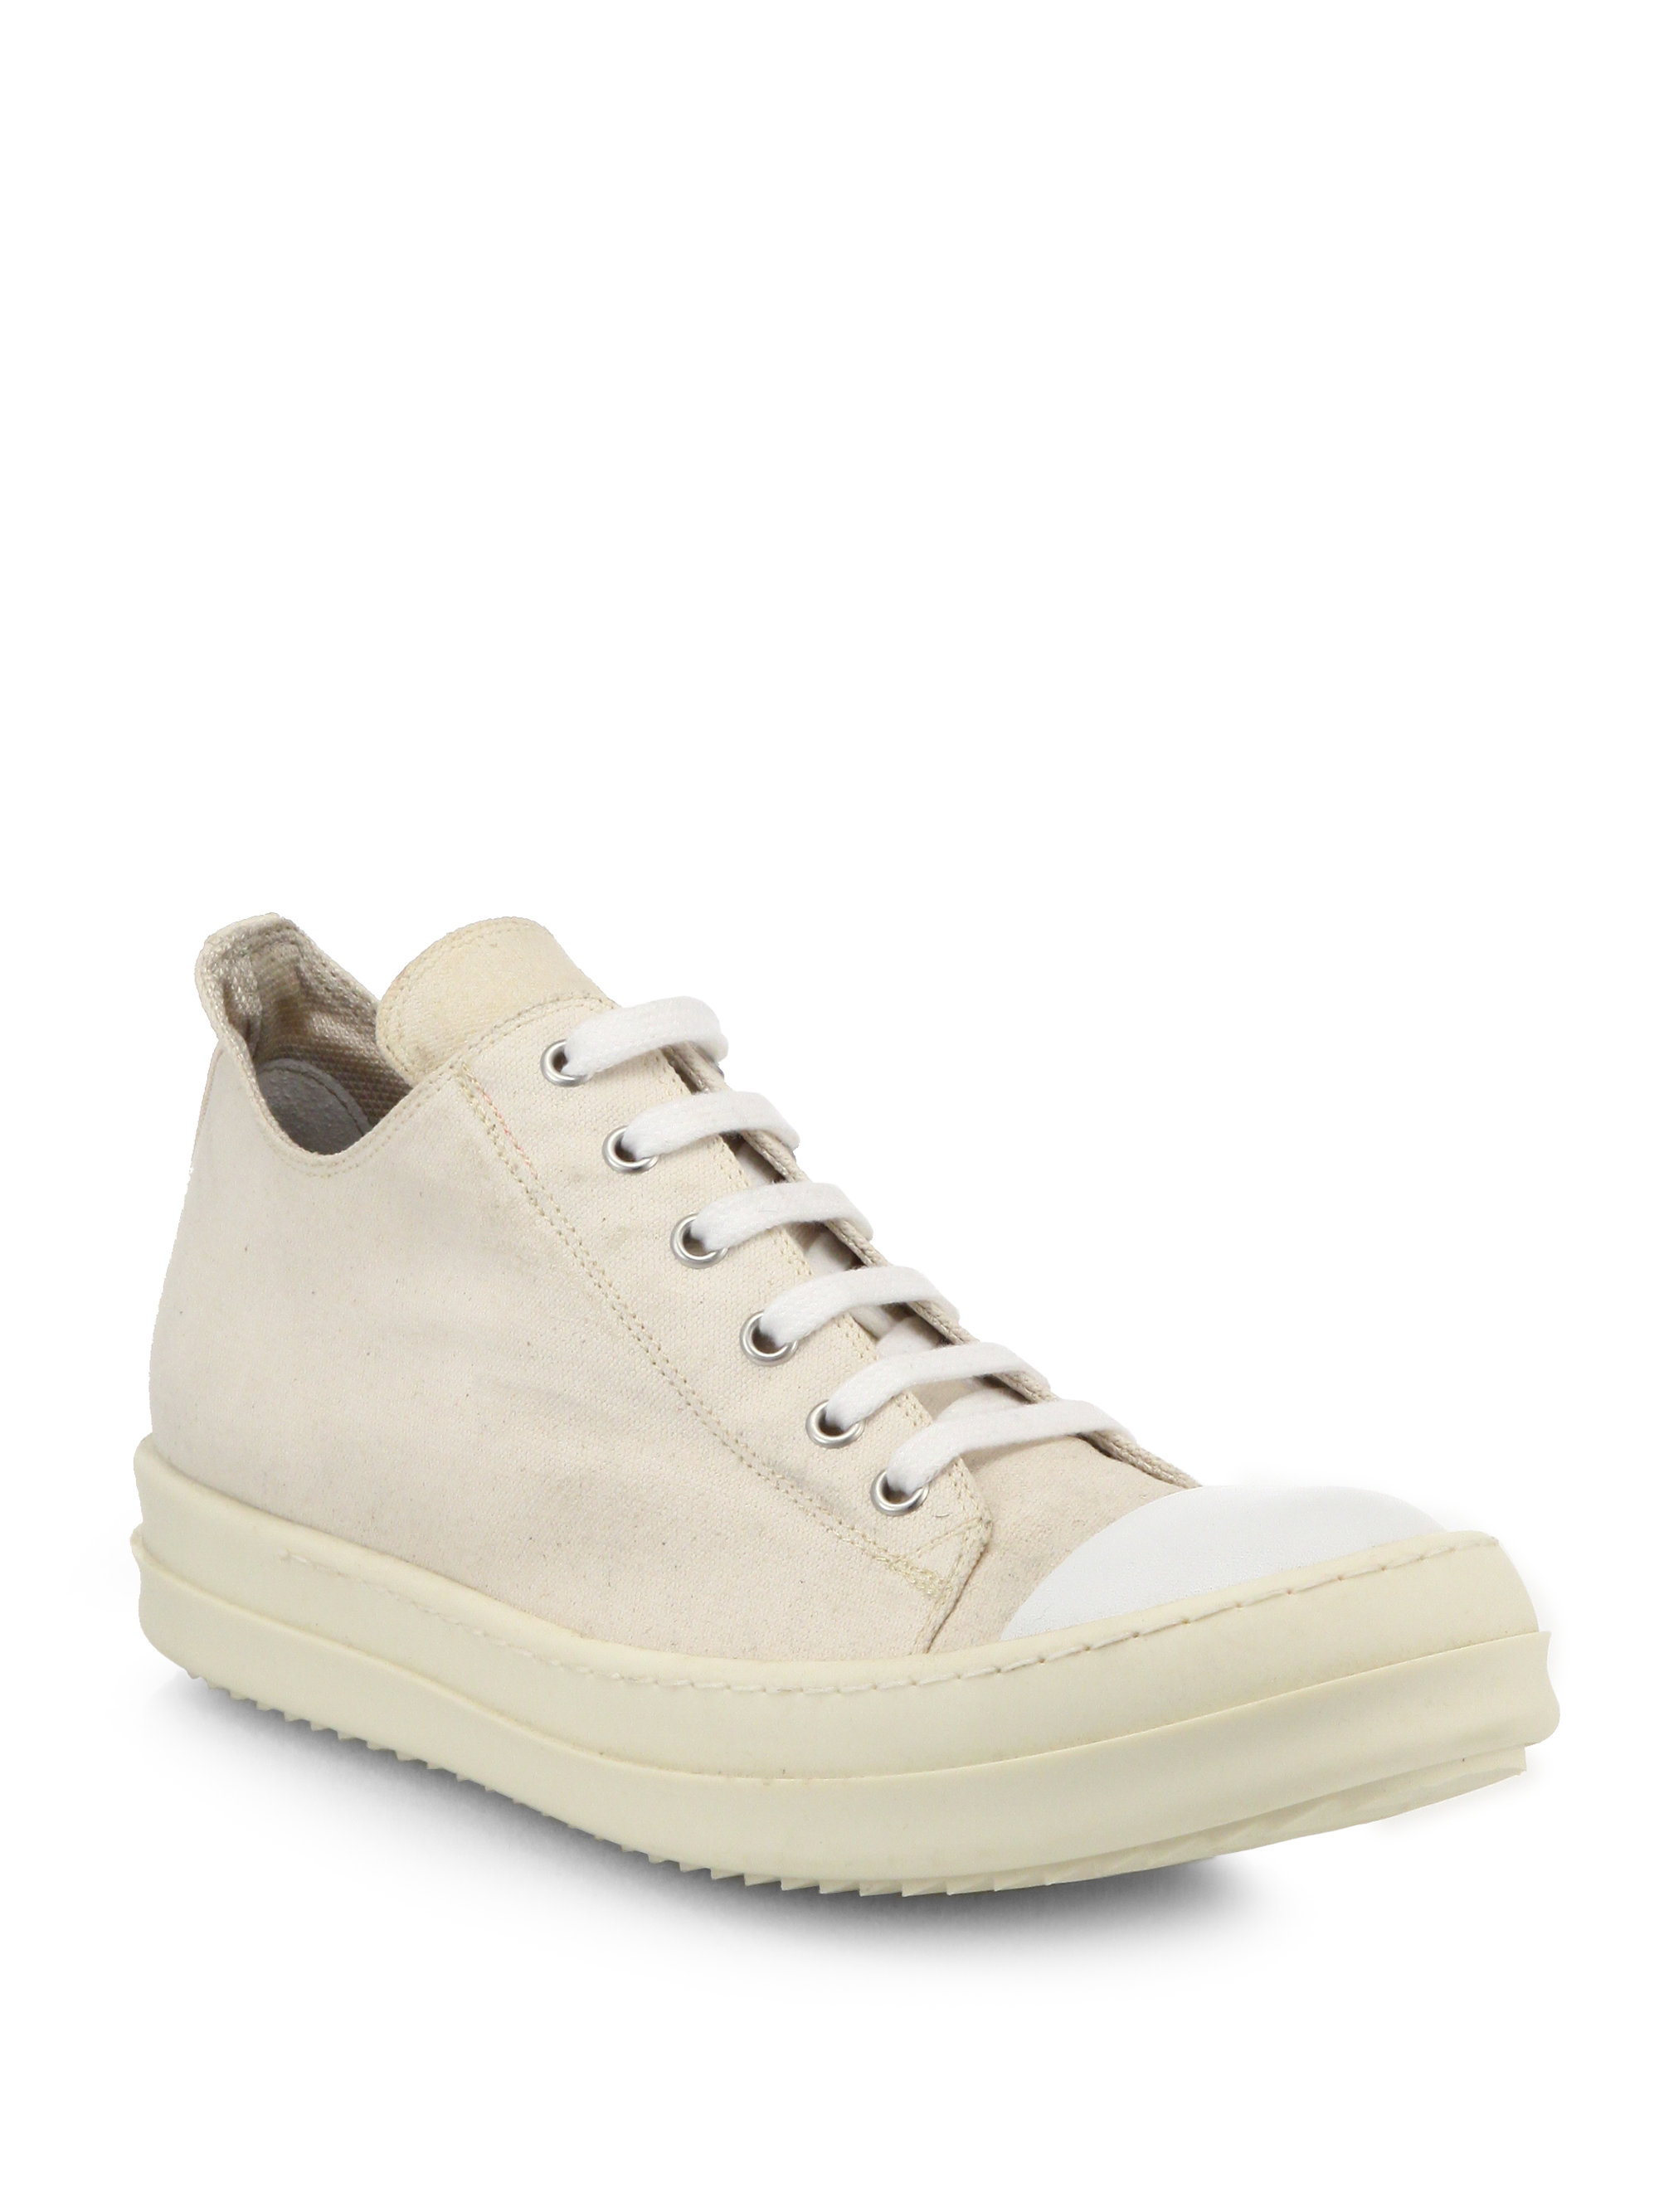 Rick OwensLow Sneakers / Milk LtmxcKlVi4